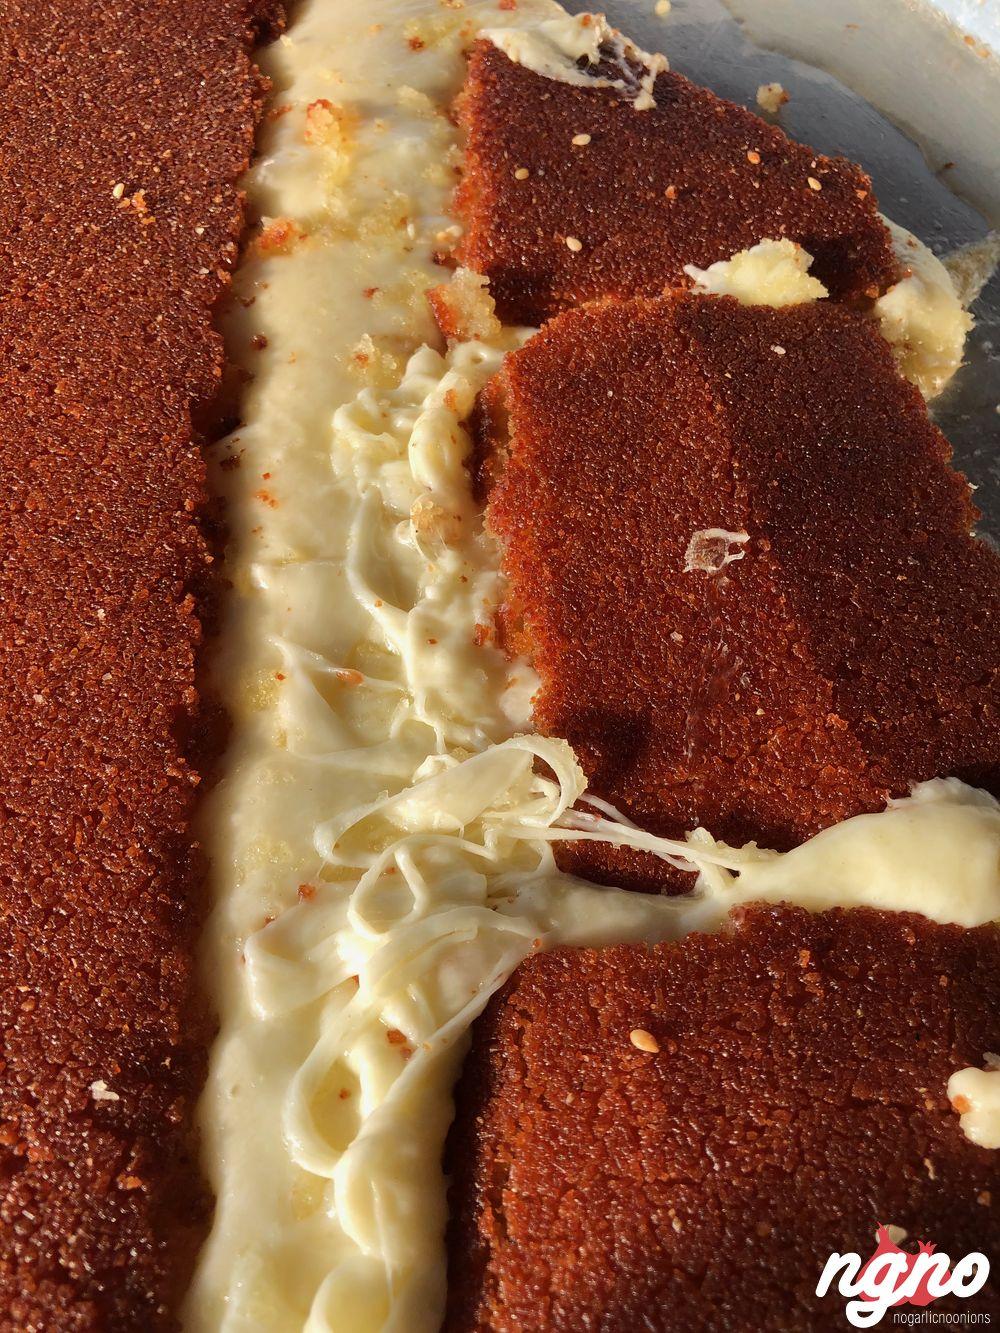 gharamti-kiblawi-sweets-saida-lebanon-nogarlicnoonions-132019-03-03-05-36-43